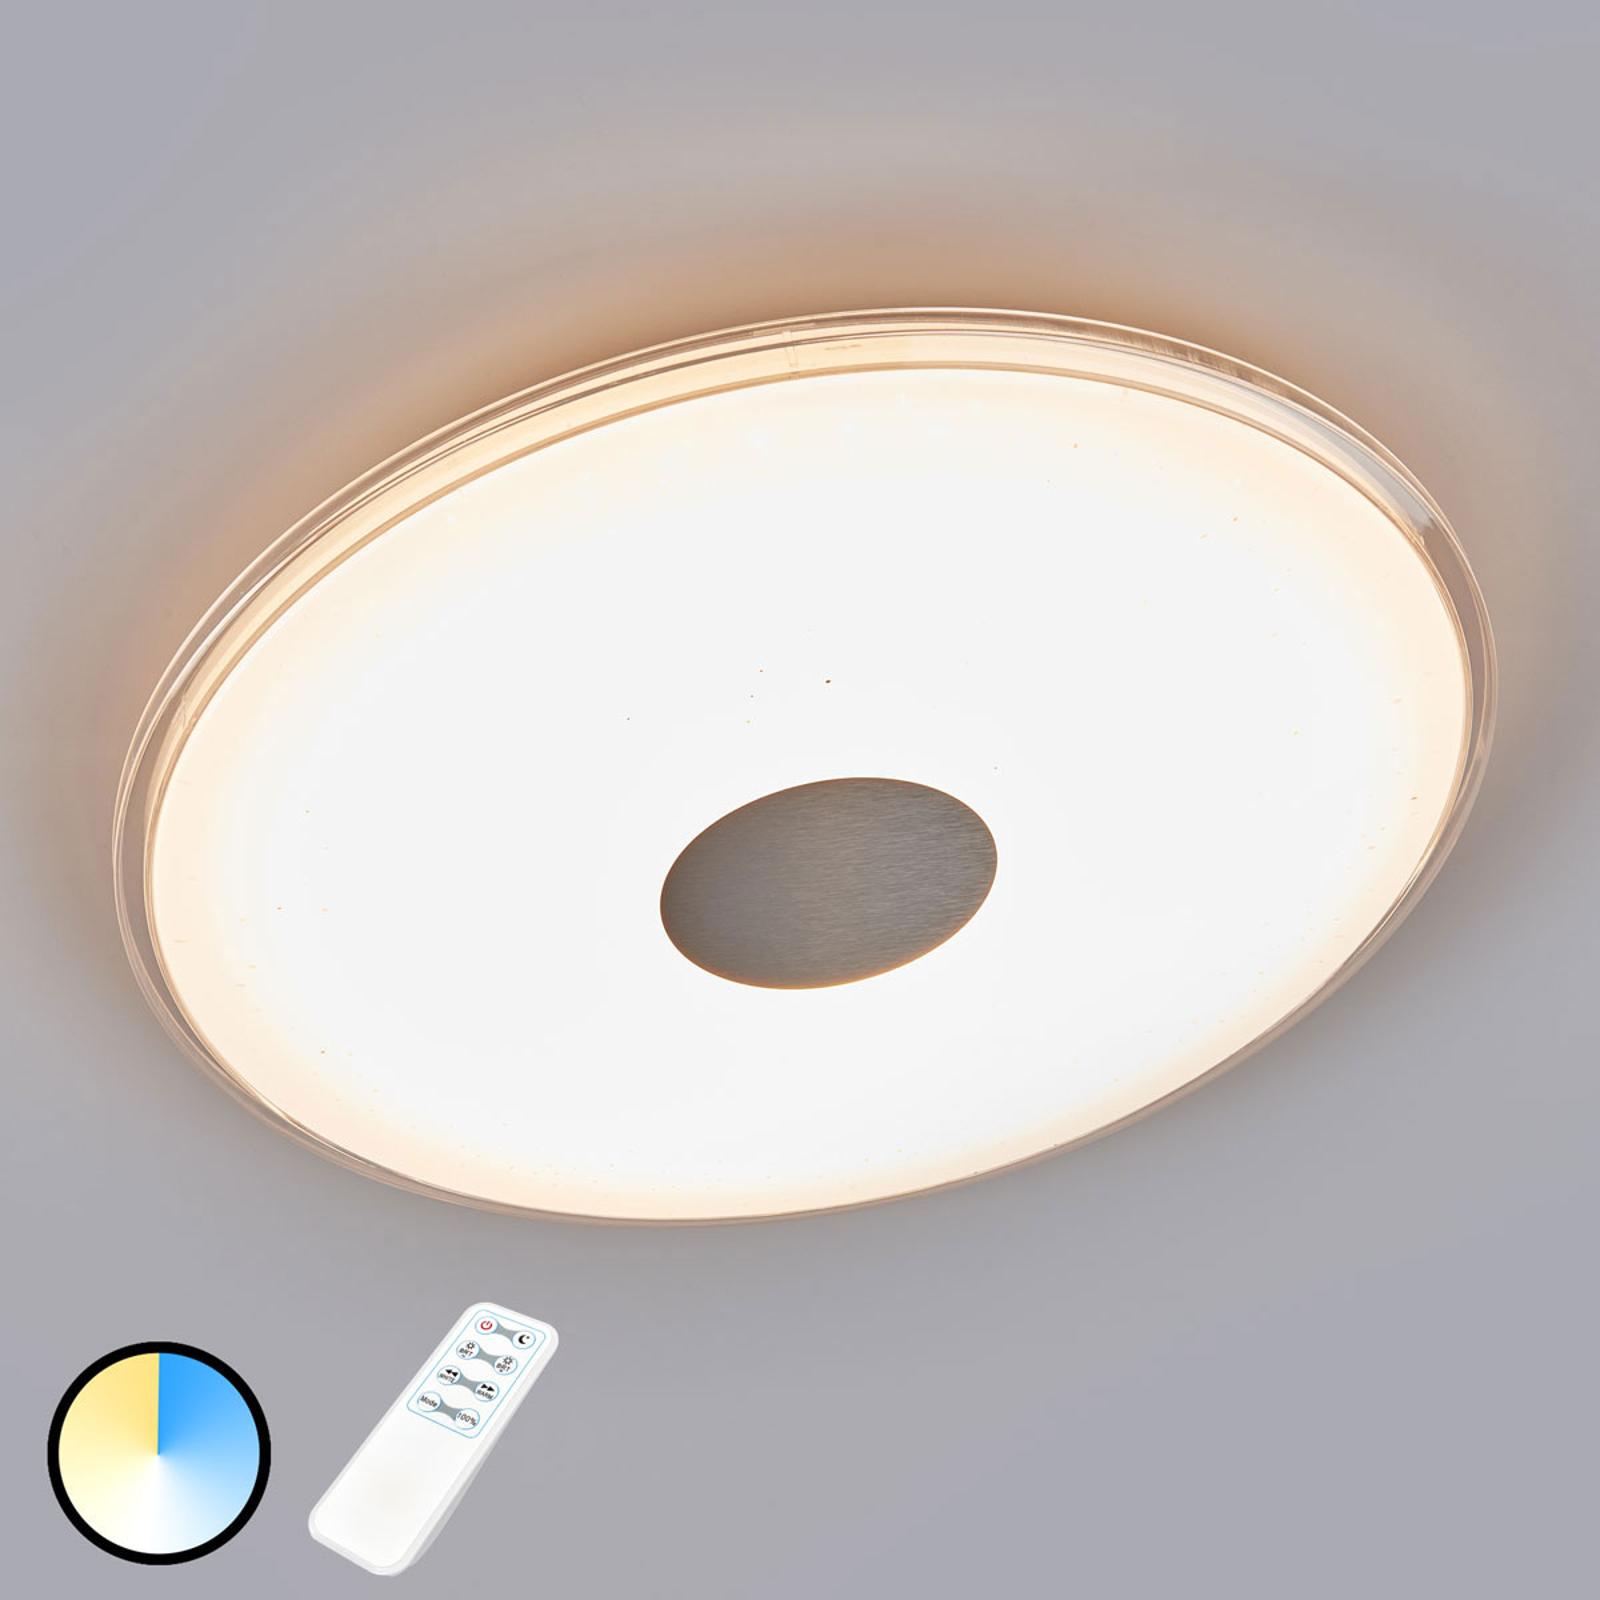 Okrągła lampa sufitowa LED Szogun, efekt skrzenia